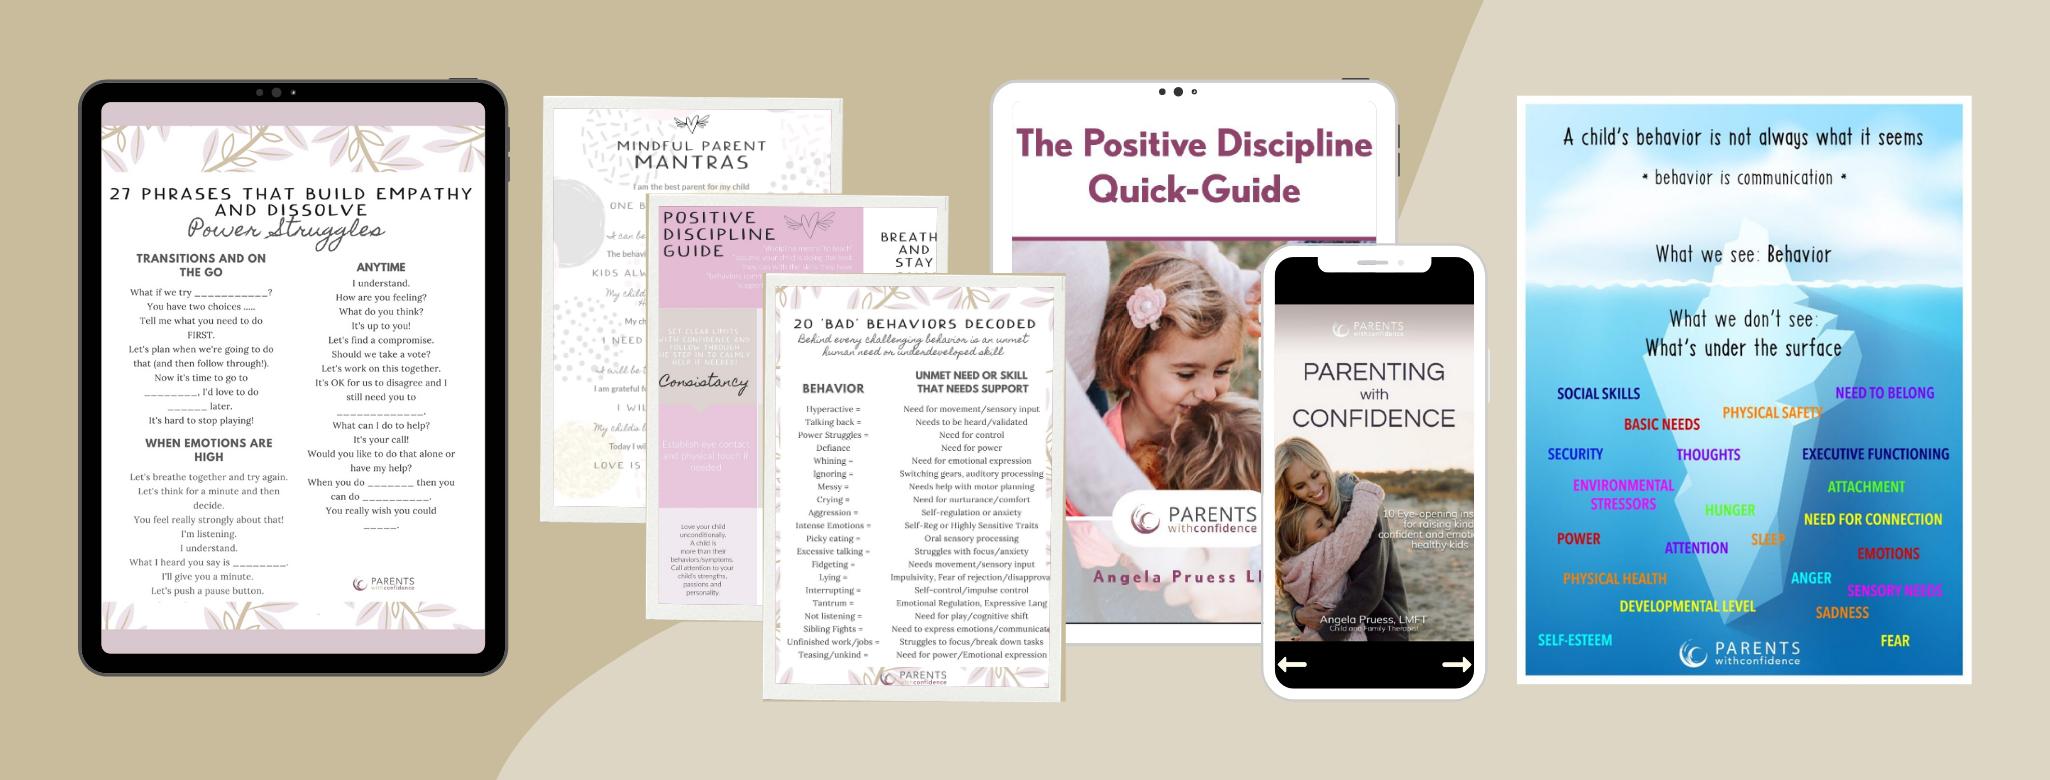 positive discipline guide